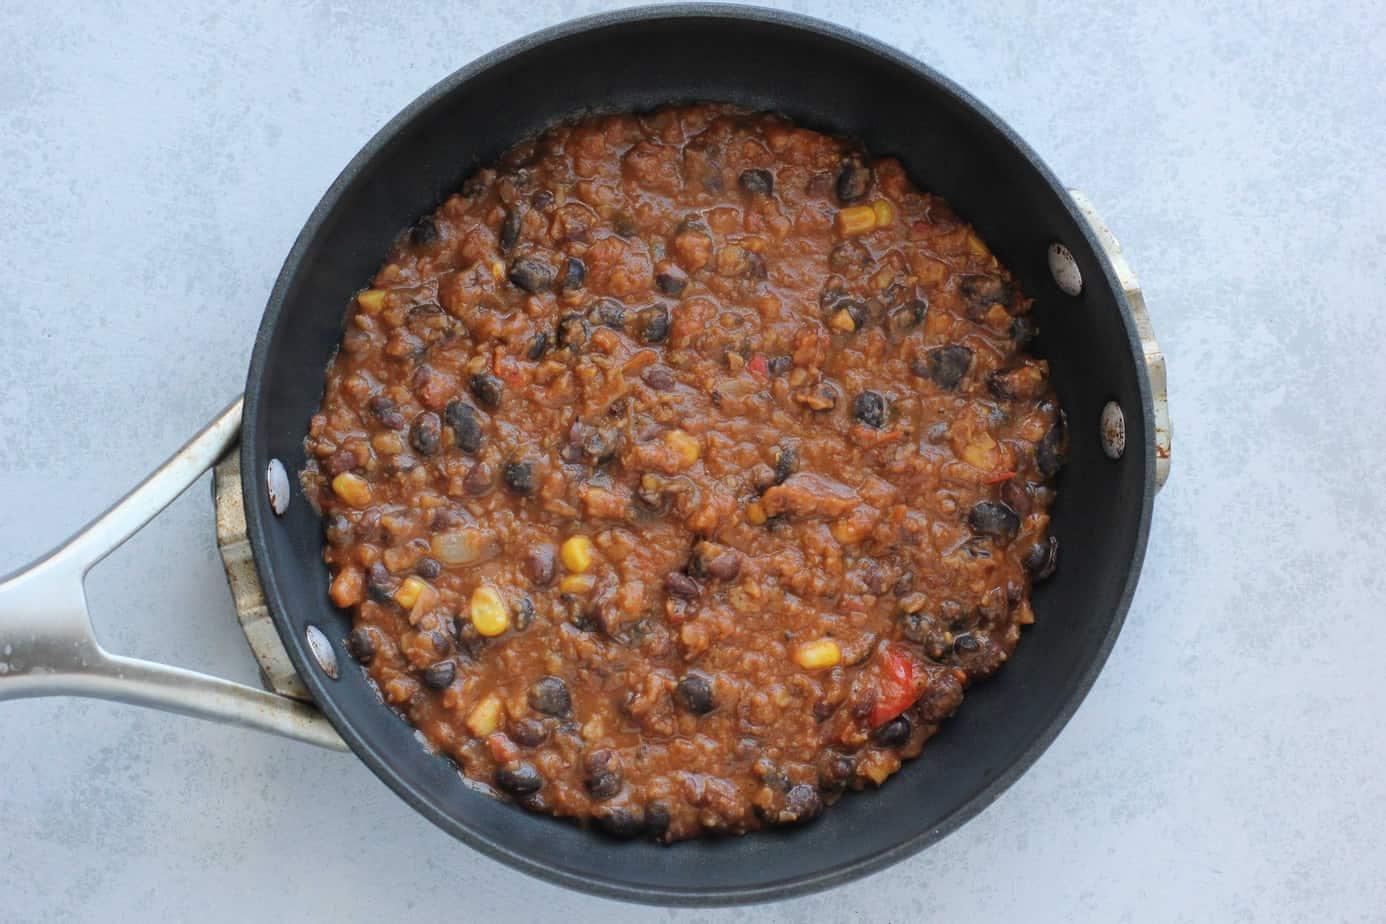 tortilla chili in a pan